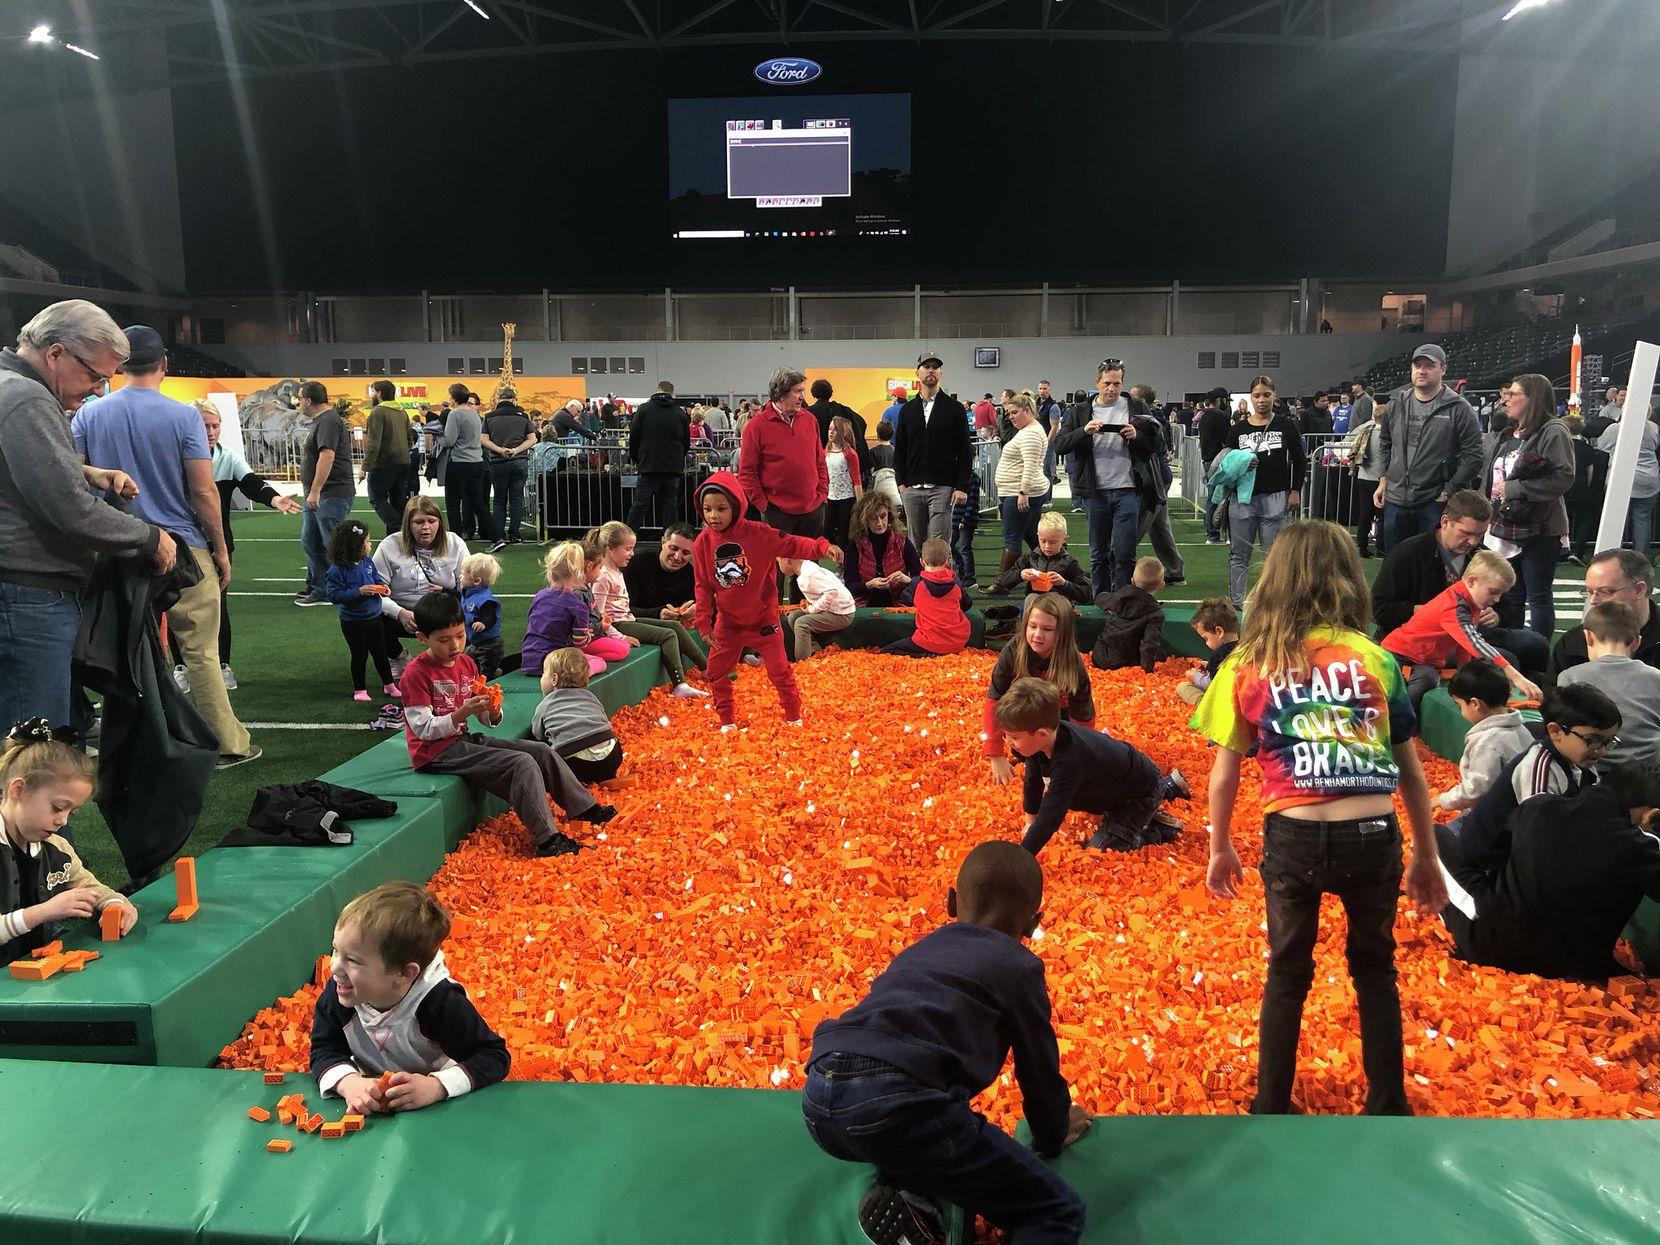 BrickLive USA, evento mundial de LEGO, se realizó este fin de semana en The Star en Frisco. Foto de Crishtbel Mora para Al Día